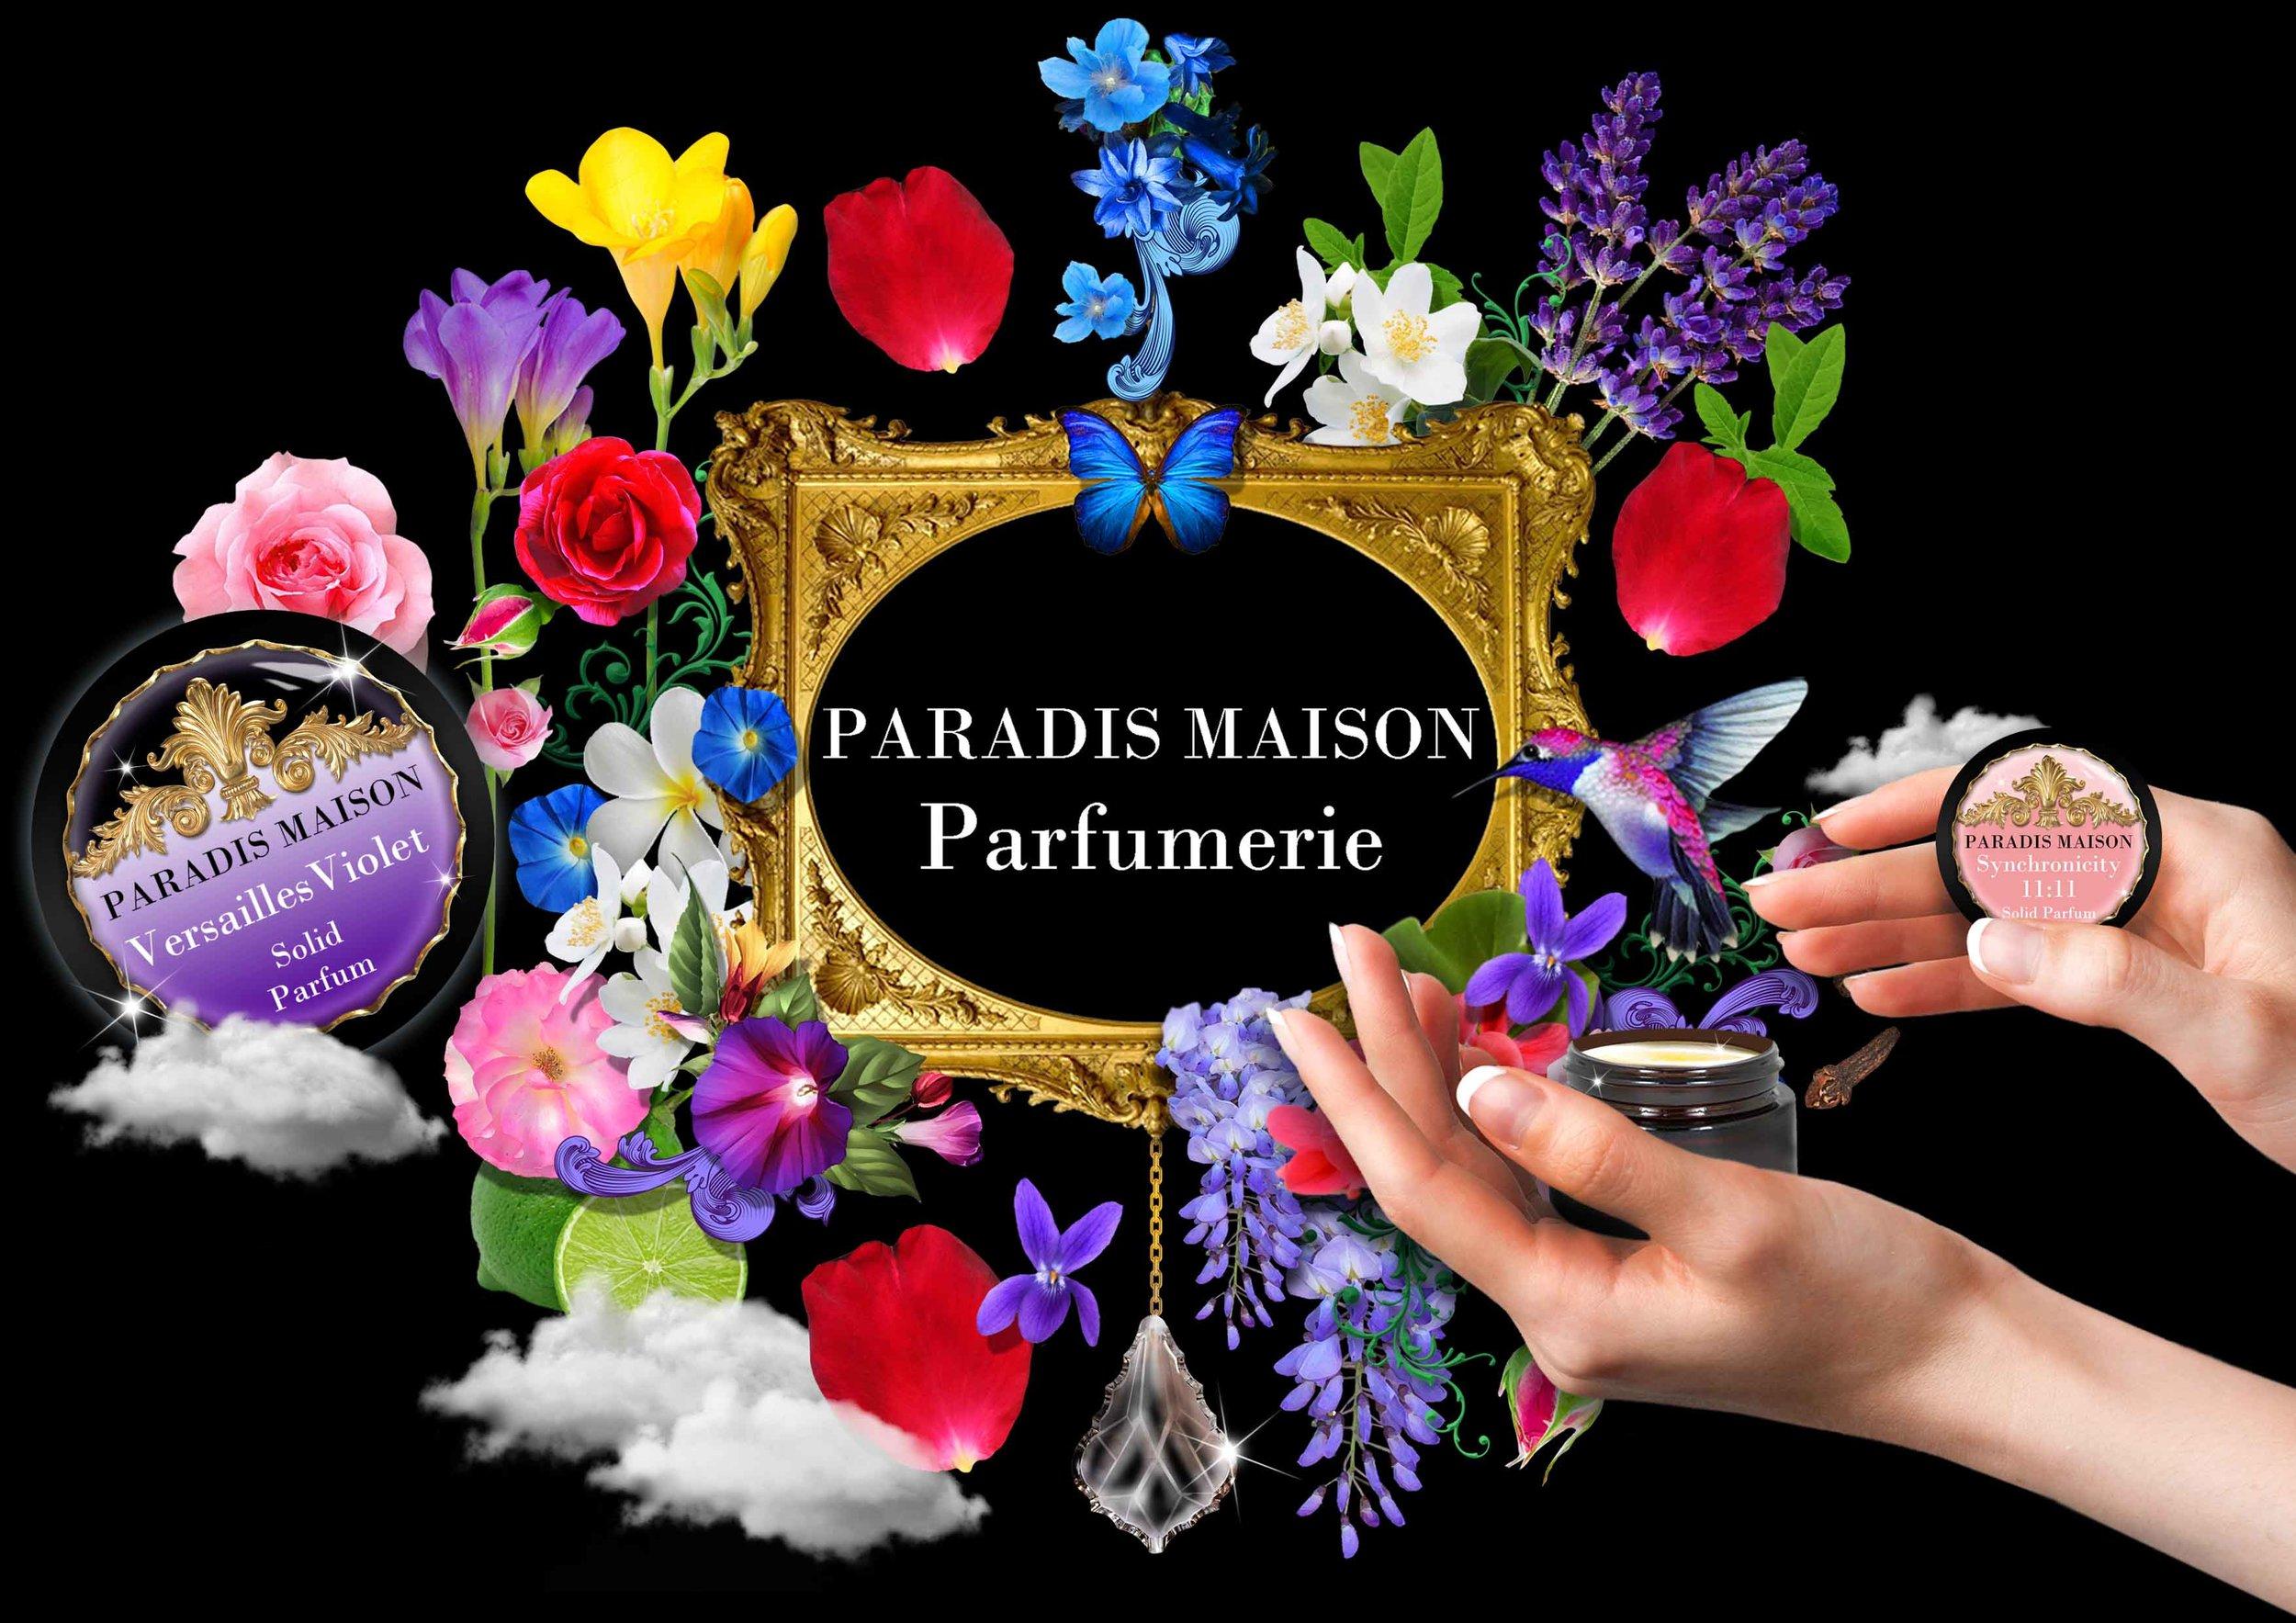 Organic Solid Perfume Paradis Maison